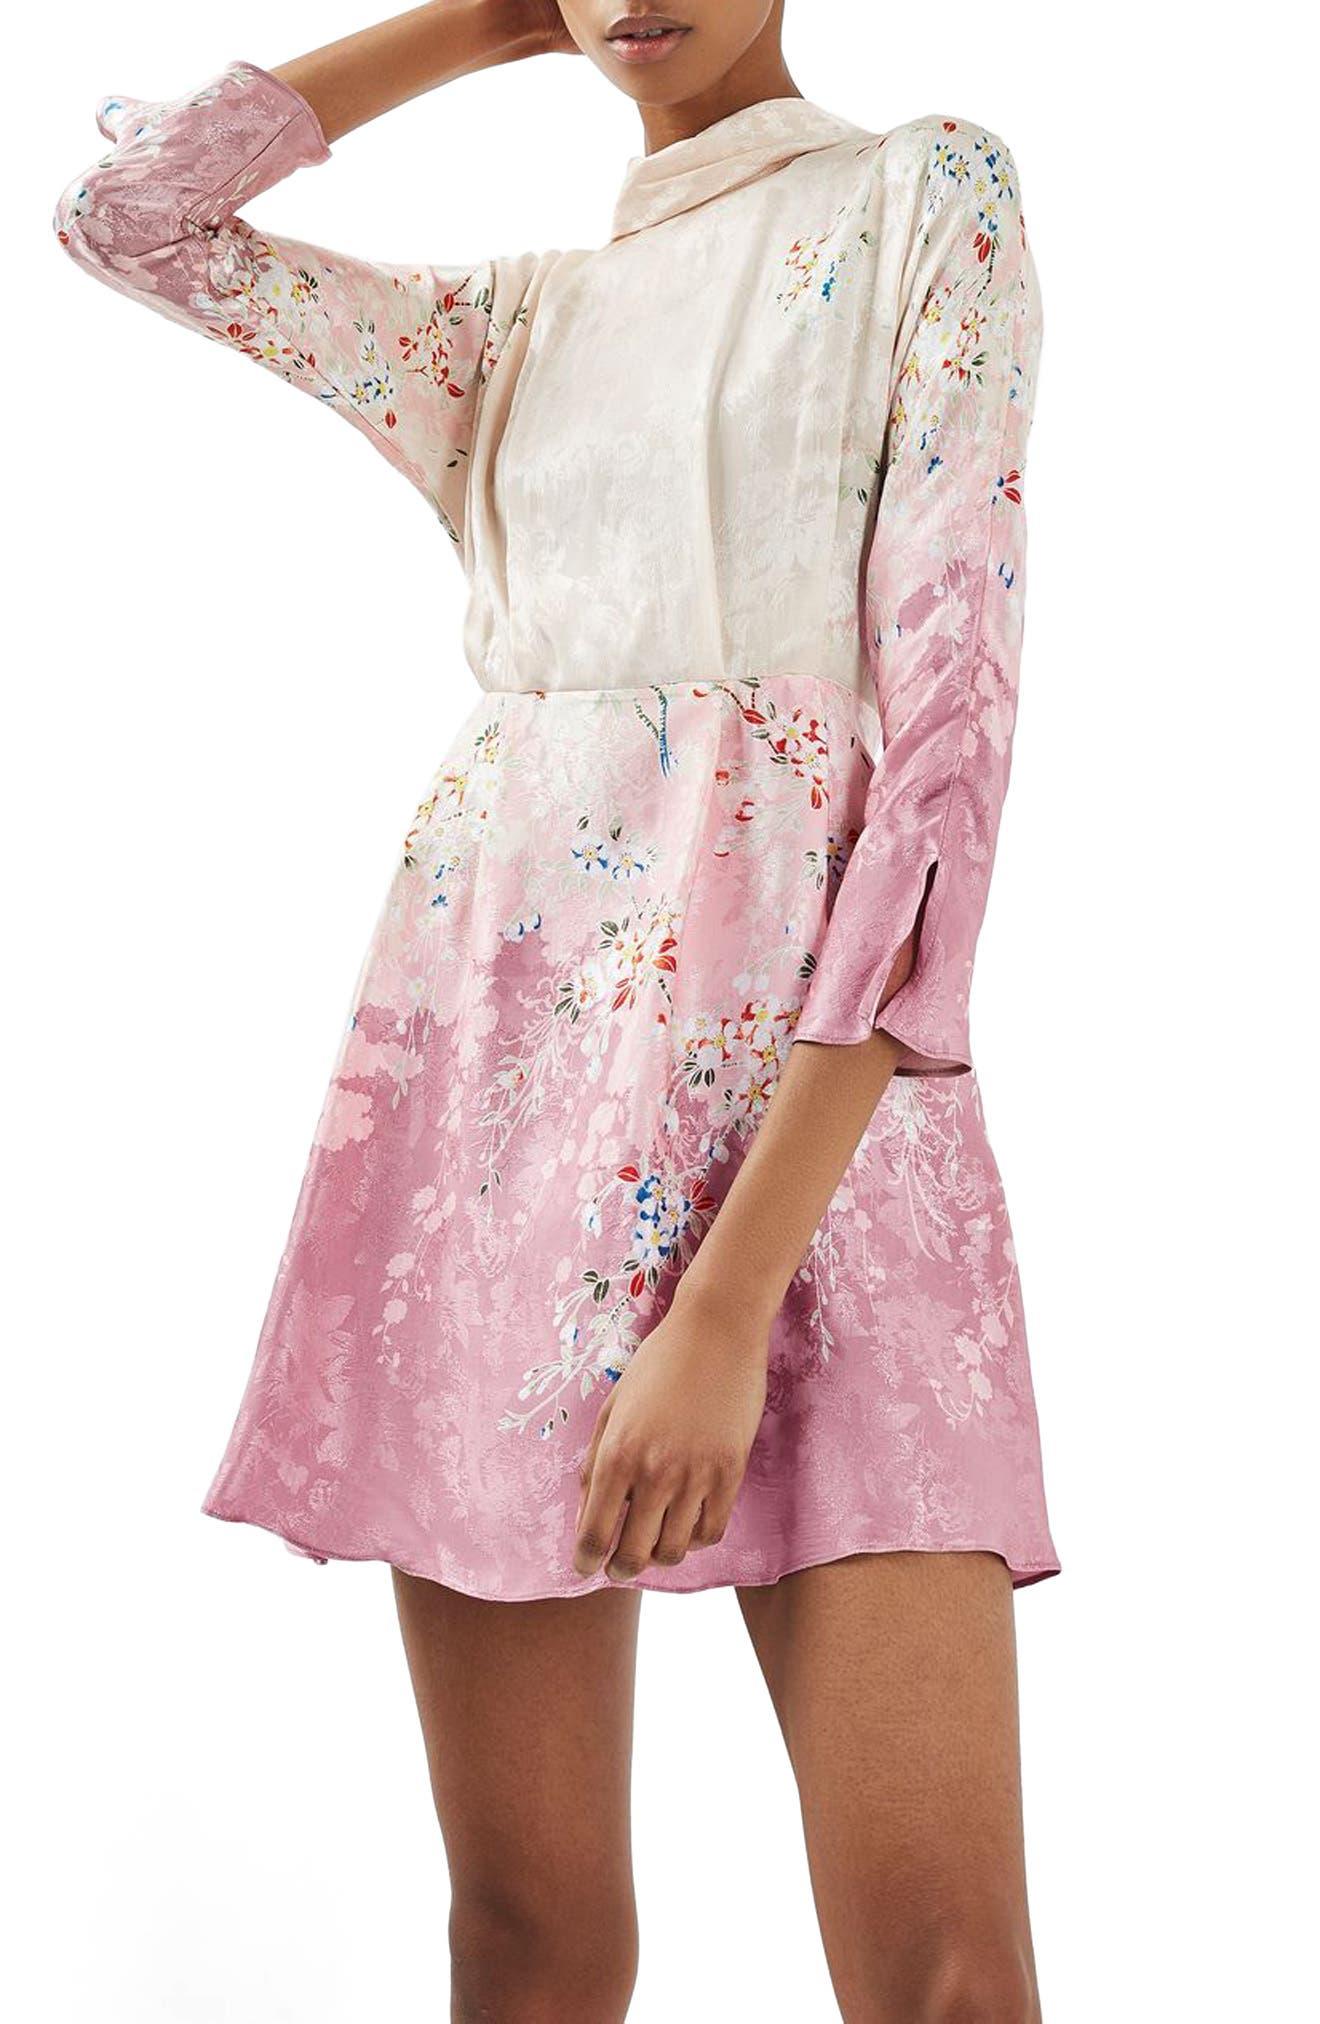 Alternate Image 1 Selected - Topshop Jacquard Floral Print Dress